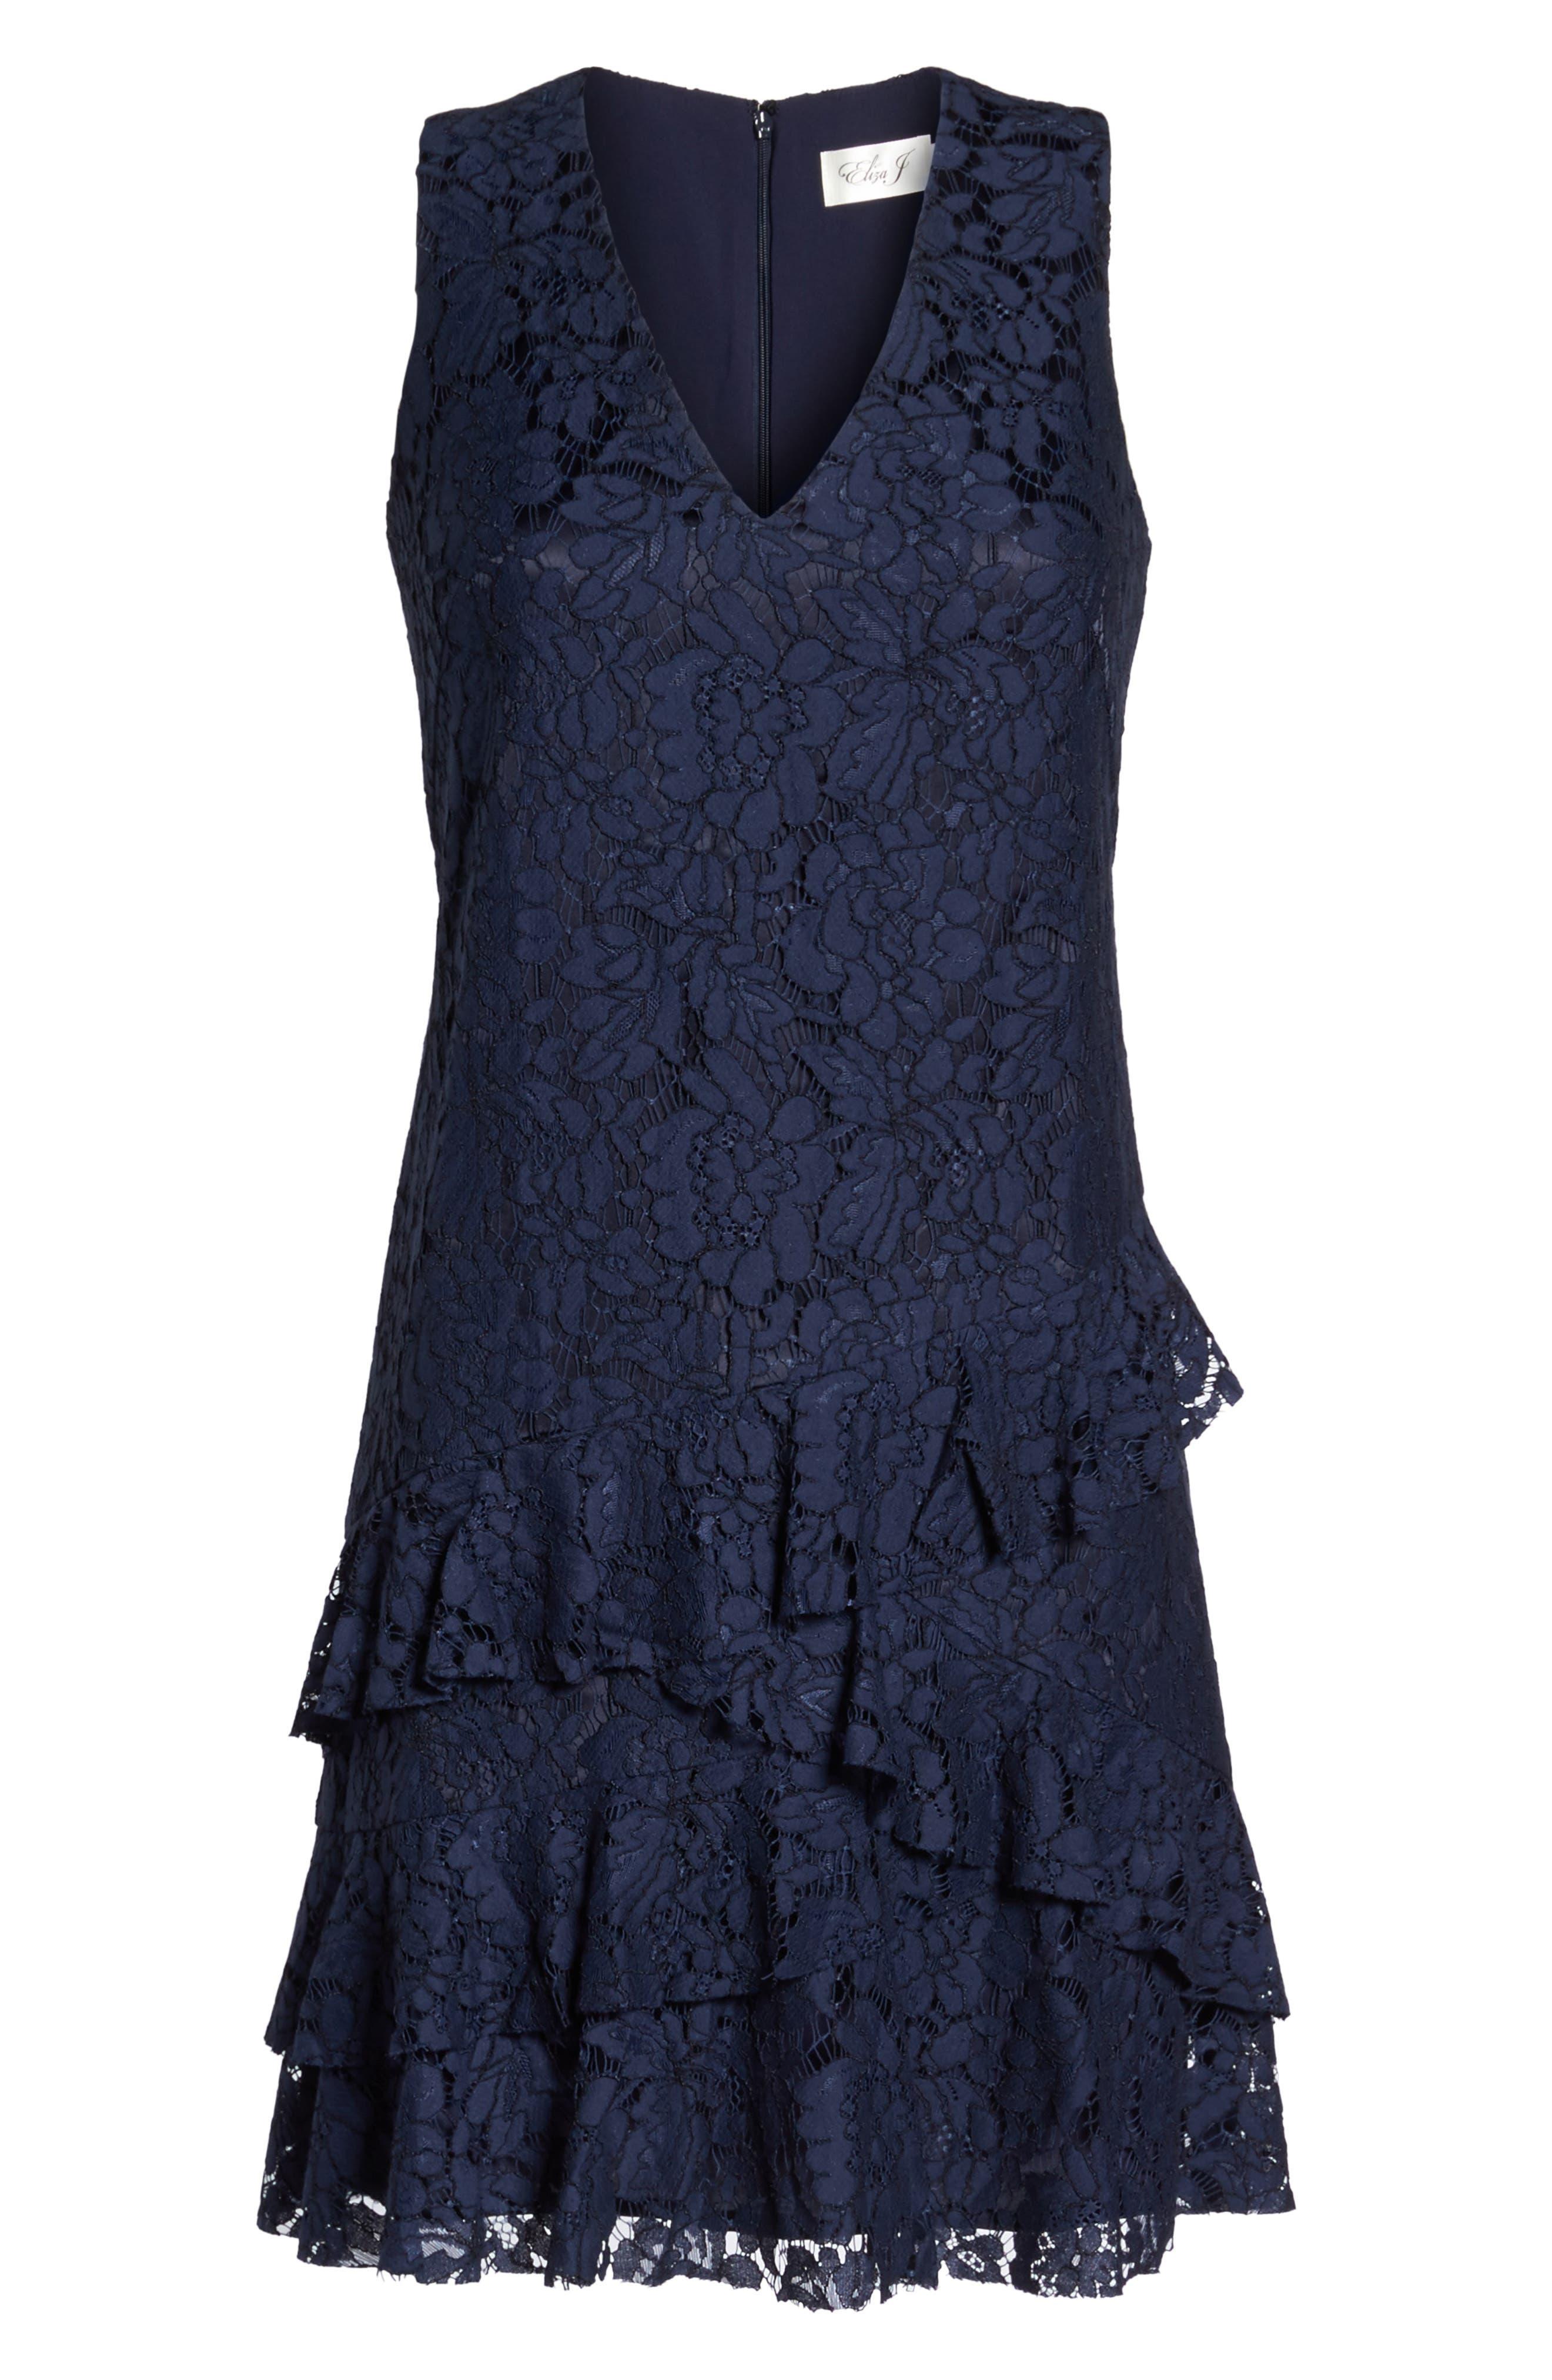 Ruffle Lace Shift Dress,                             Alternate thumbnail 6, color,                             Navy